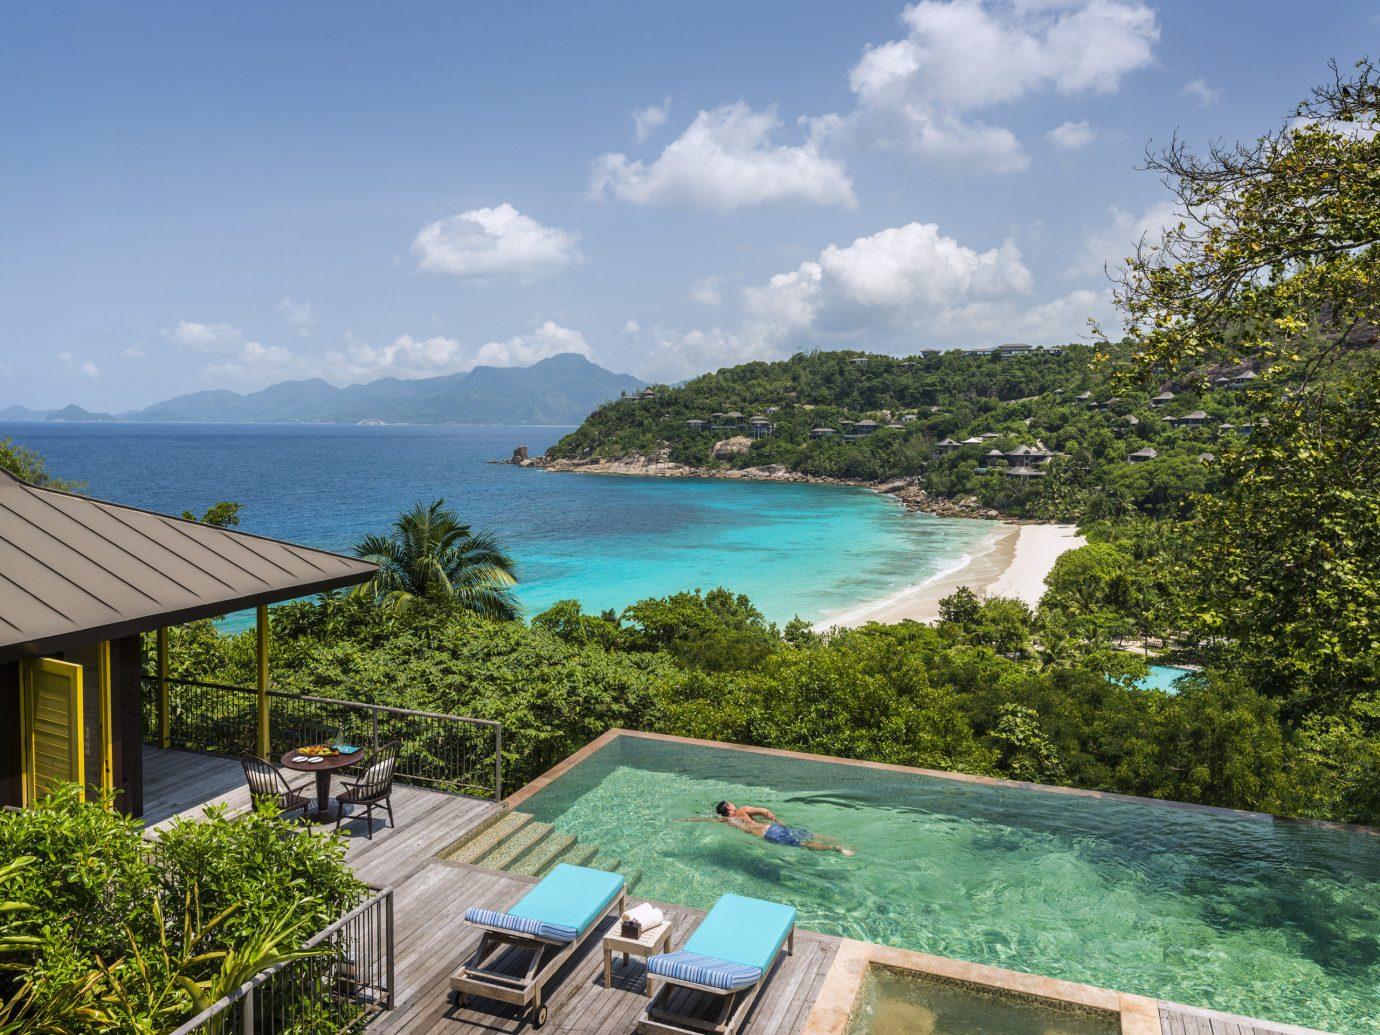 Hotels Trip Ideas tree sky outdoor property vacation swimming pool estate Resort Sea bay caribbean Villa Beach real estate Coast tropics overlooking shore day